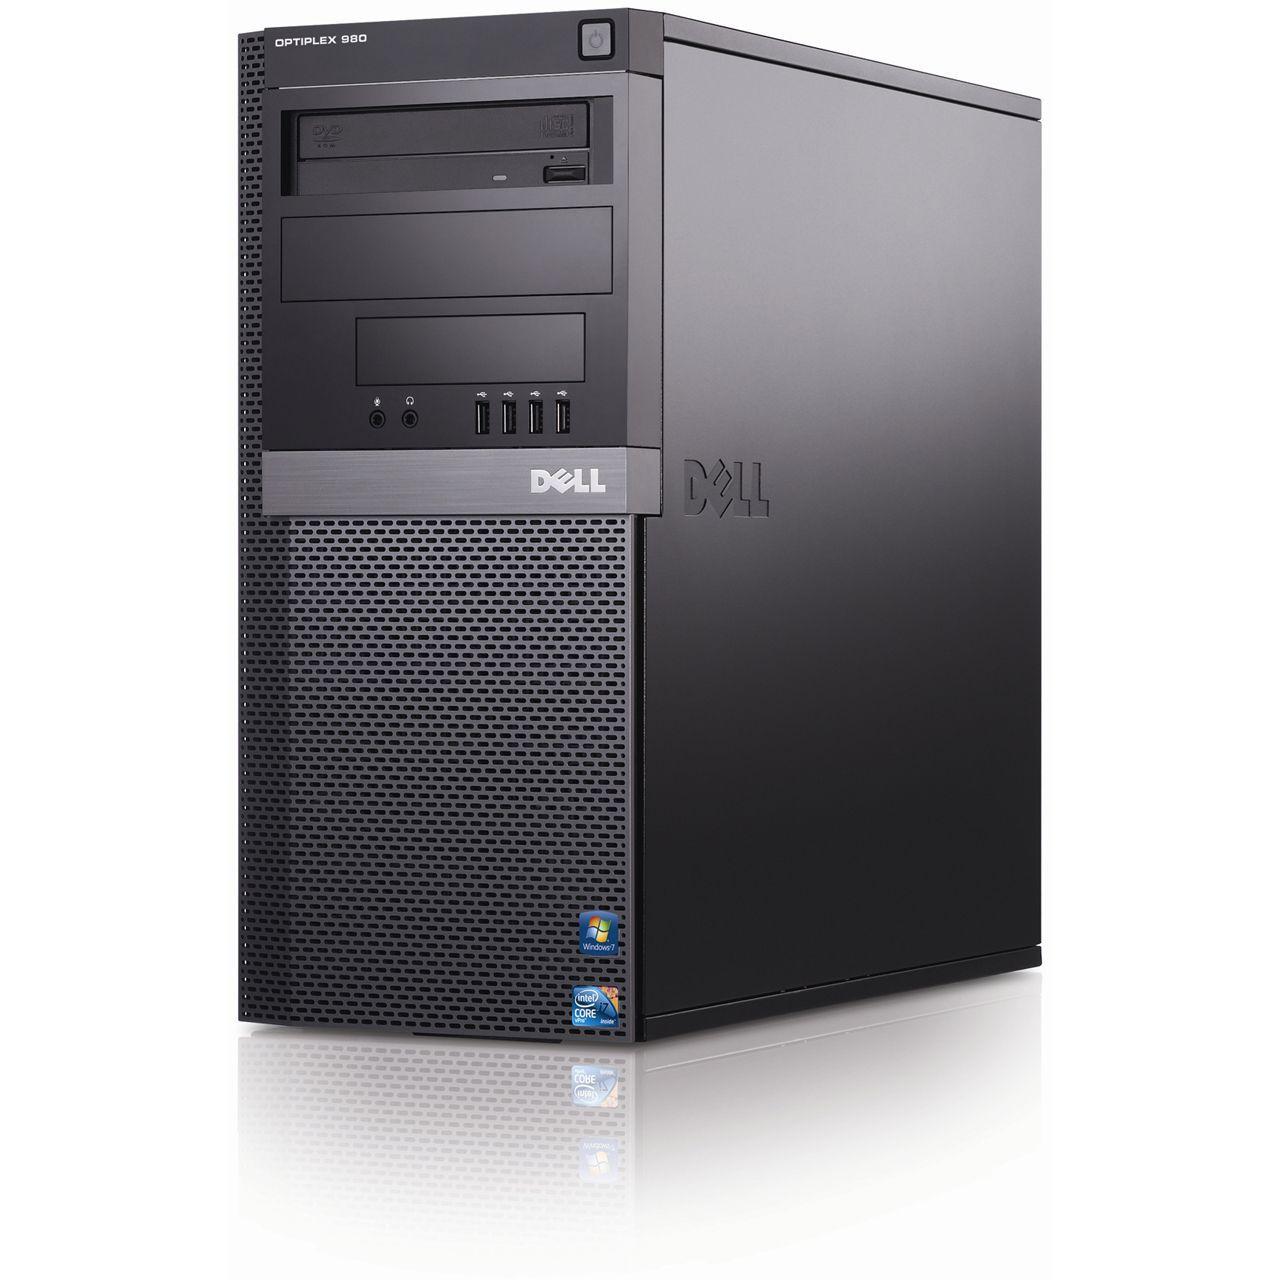 Refurbished Dell optiplex 980 Mini Tower - Front view